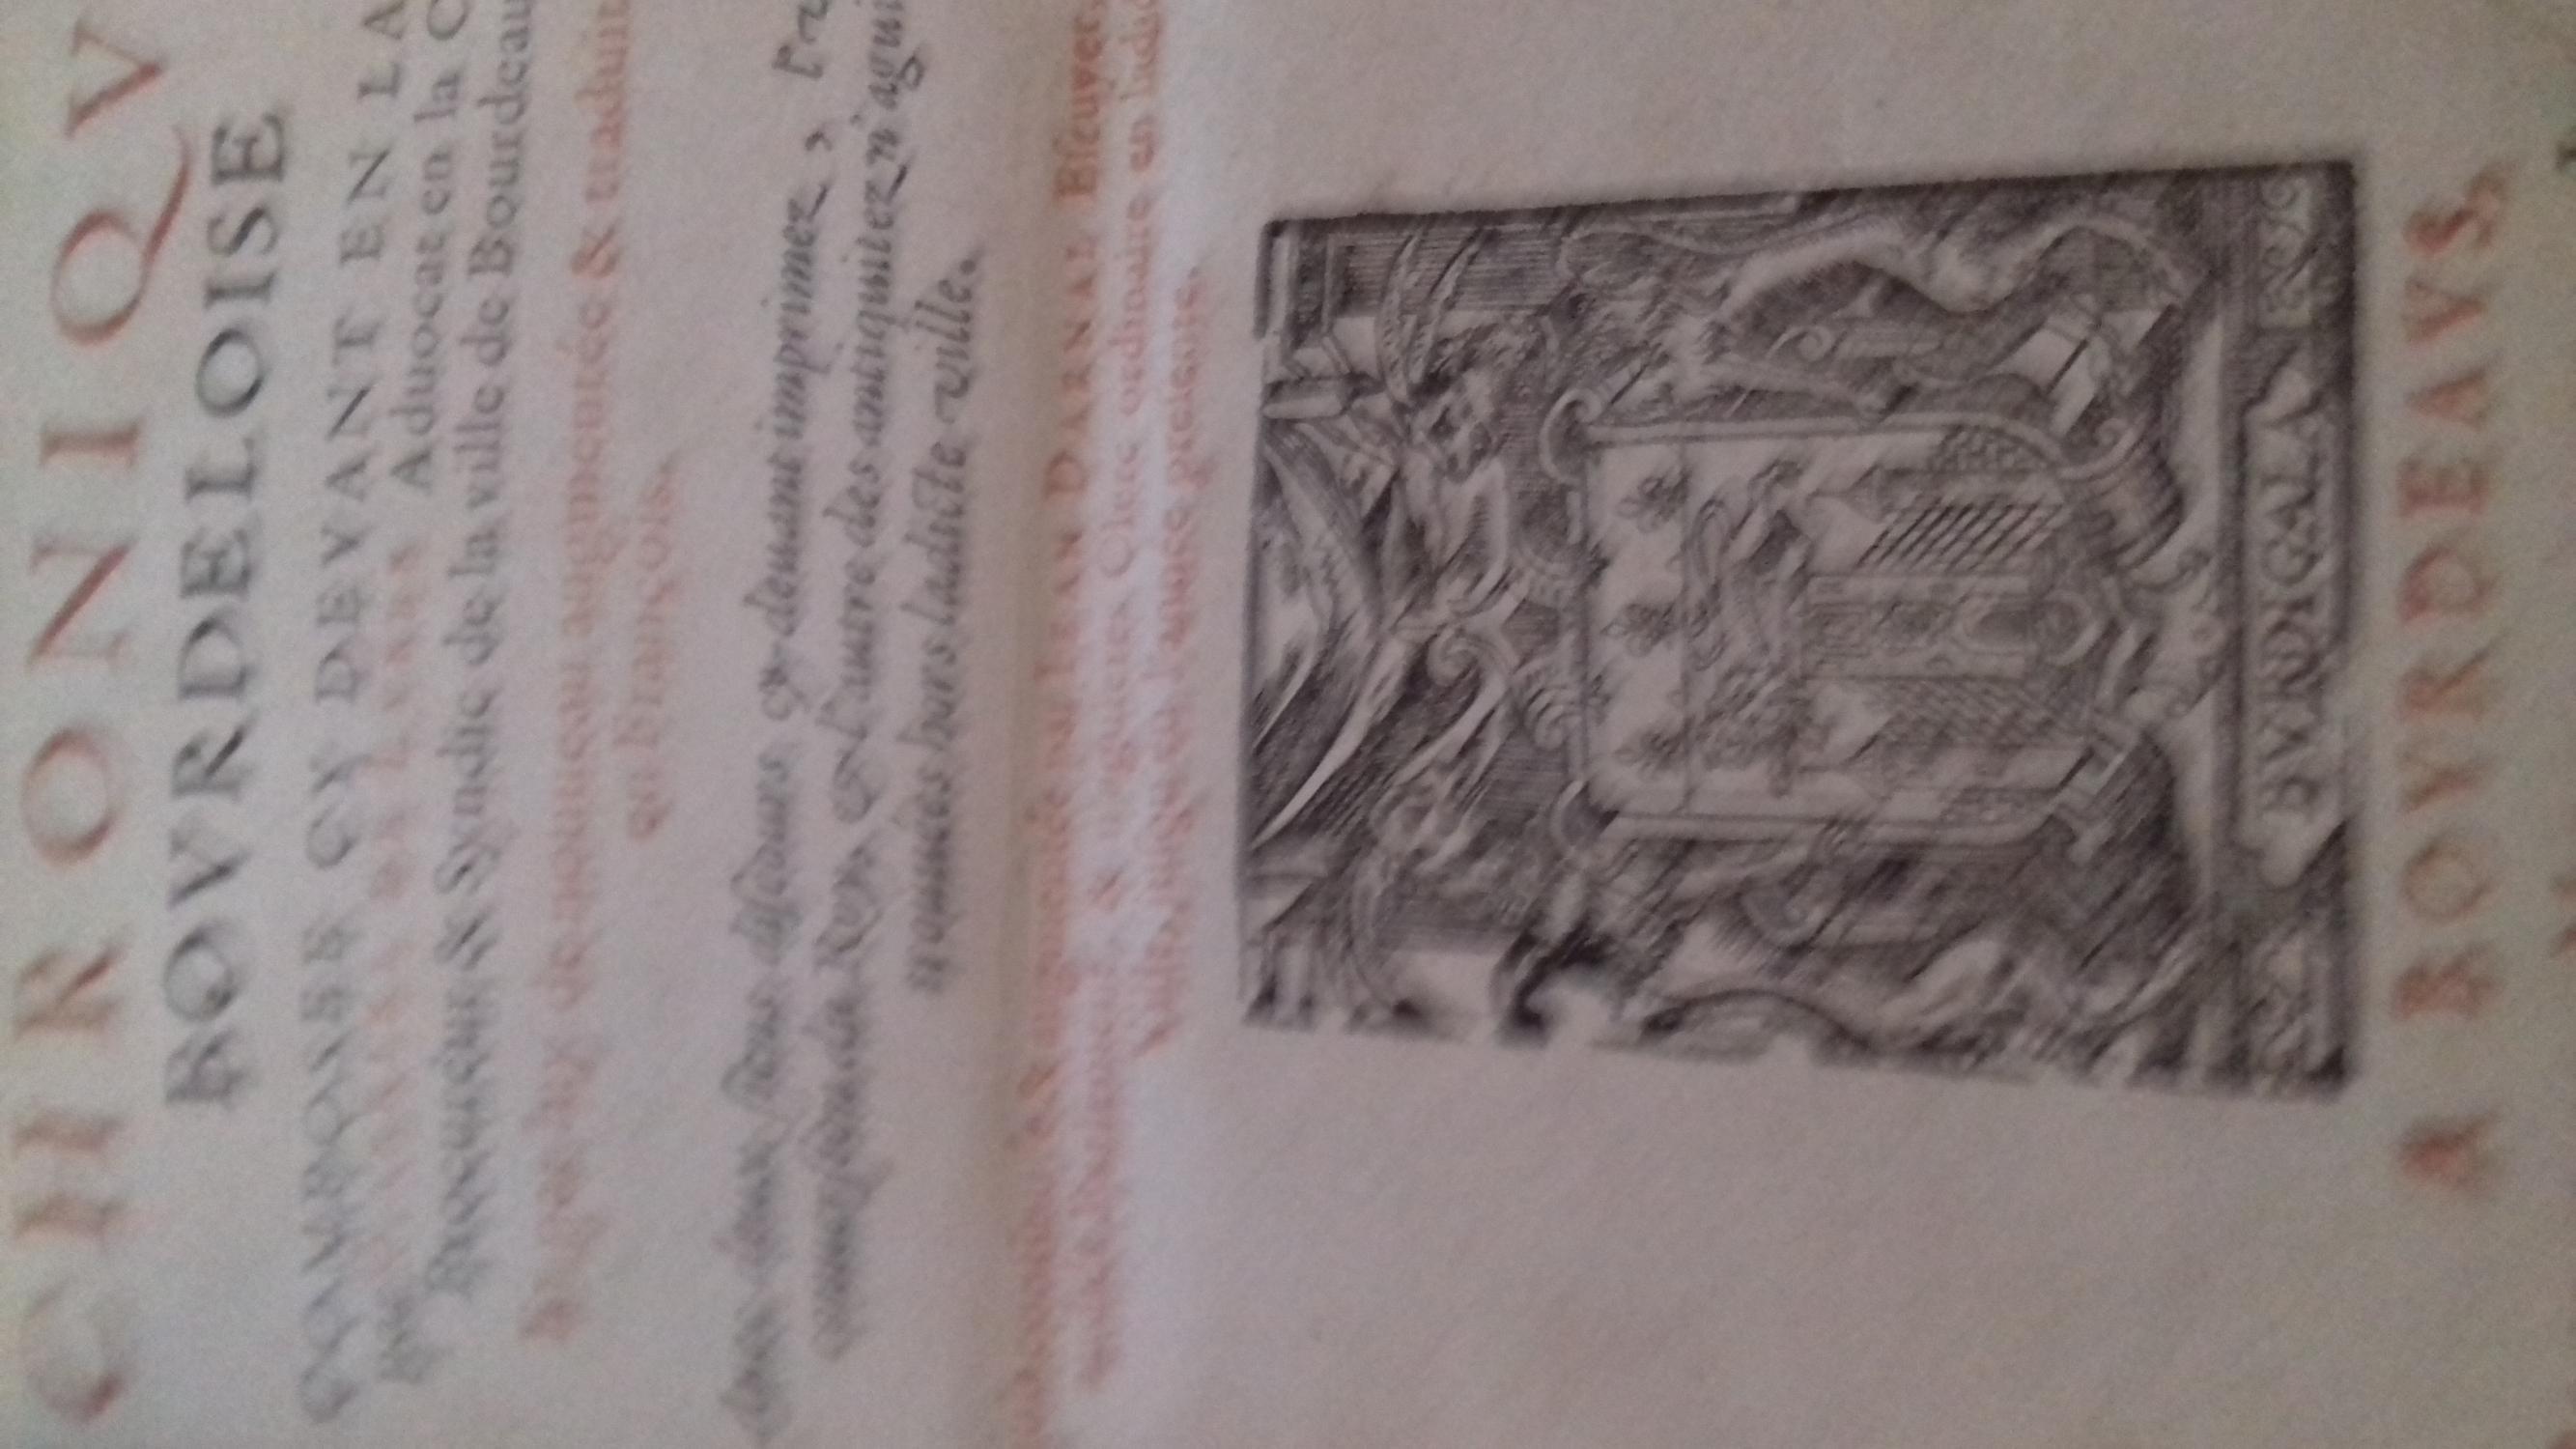 chronique bourdeloise gabriel de lurbe Near Fine Hardcover